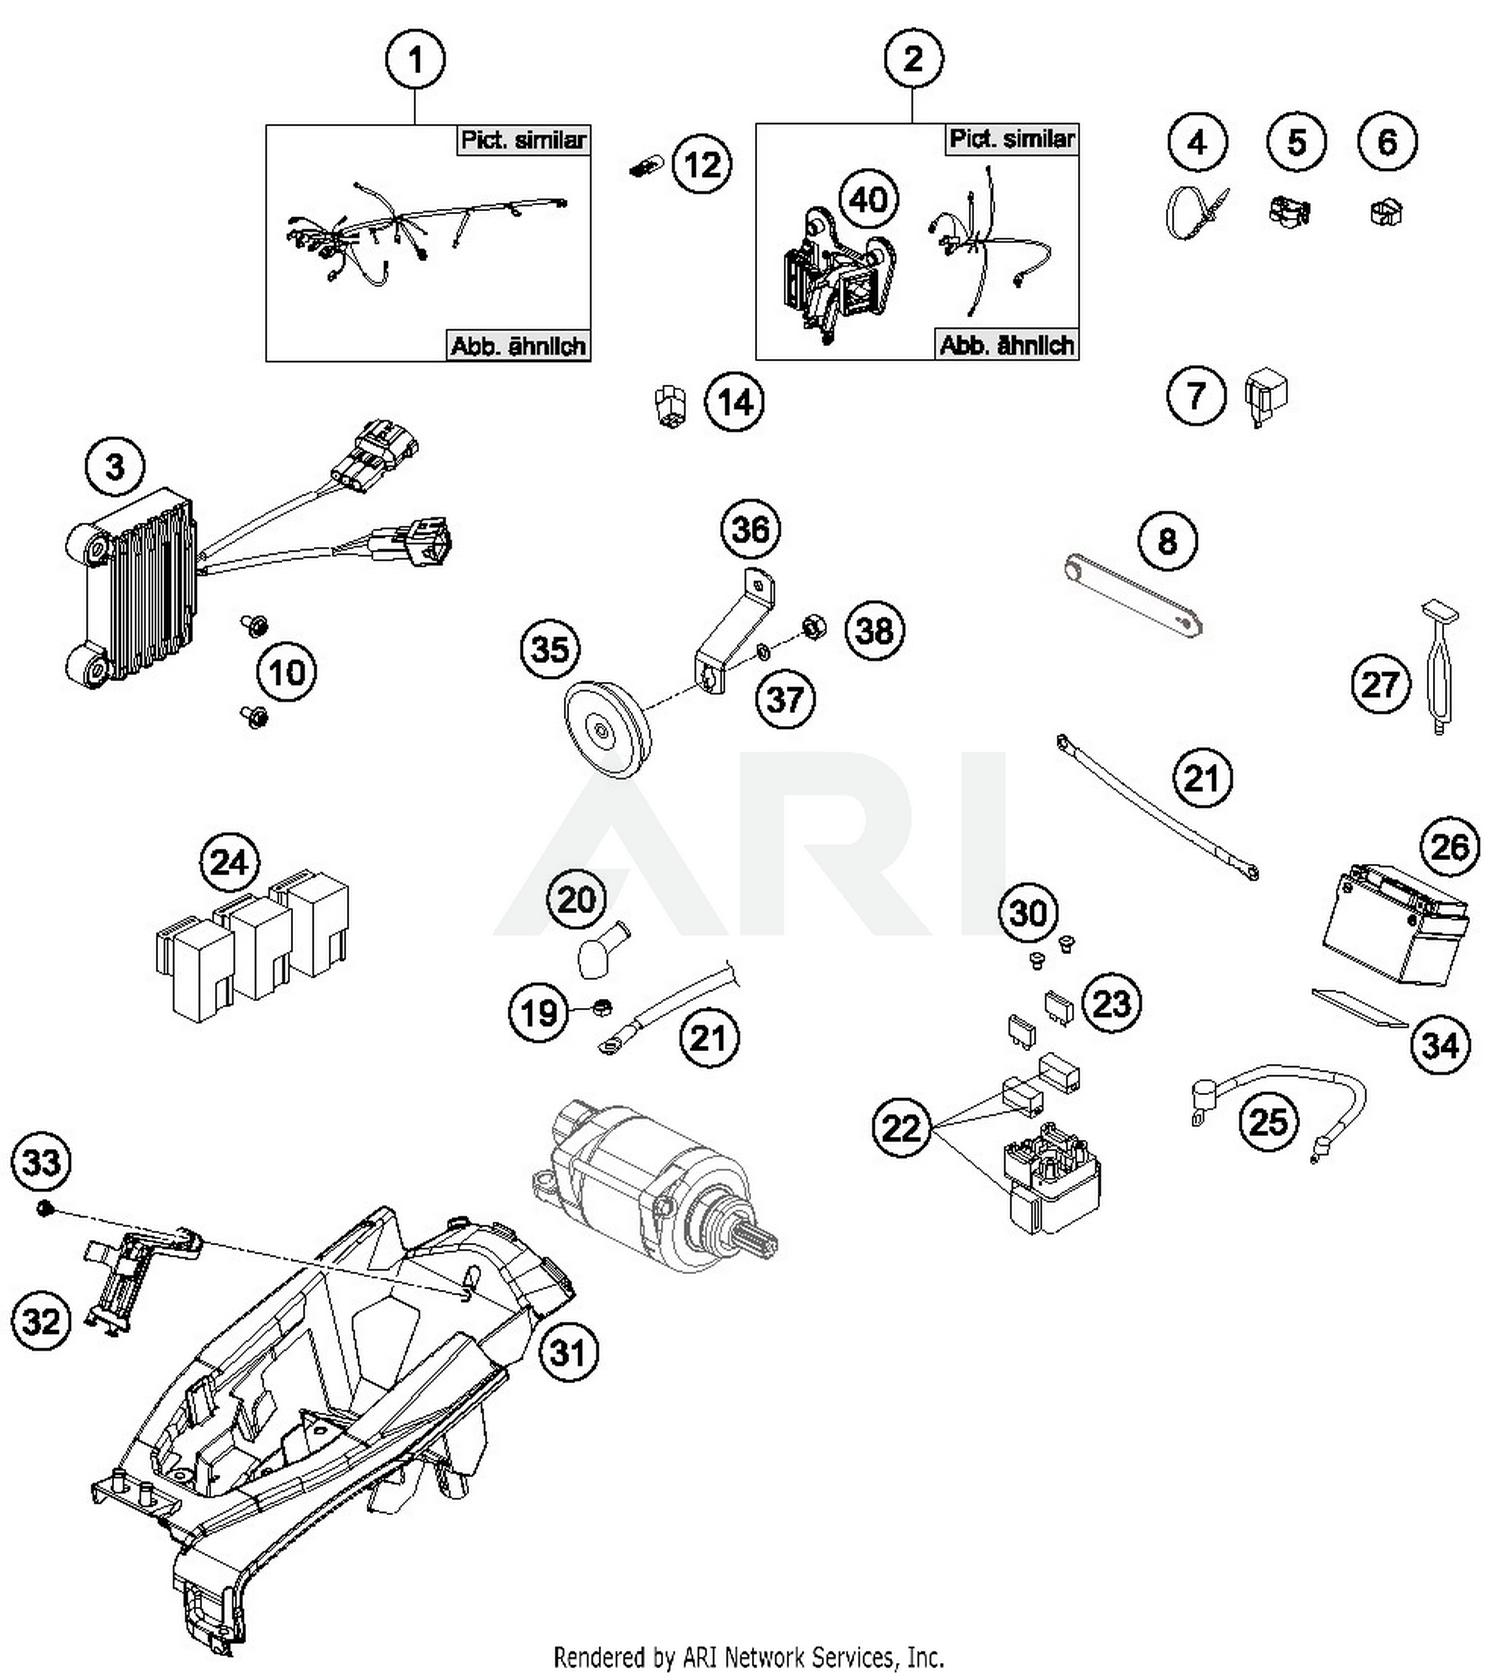 Wiring Diagram Husqvarna Motorcycles Schematic Diagrams Ayp Harness 2017 Fe 450 Parts Best Oem